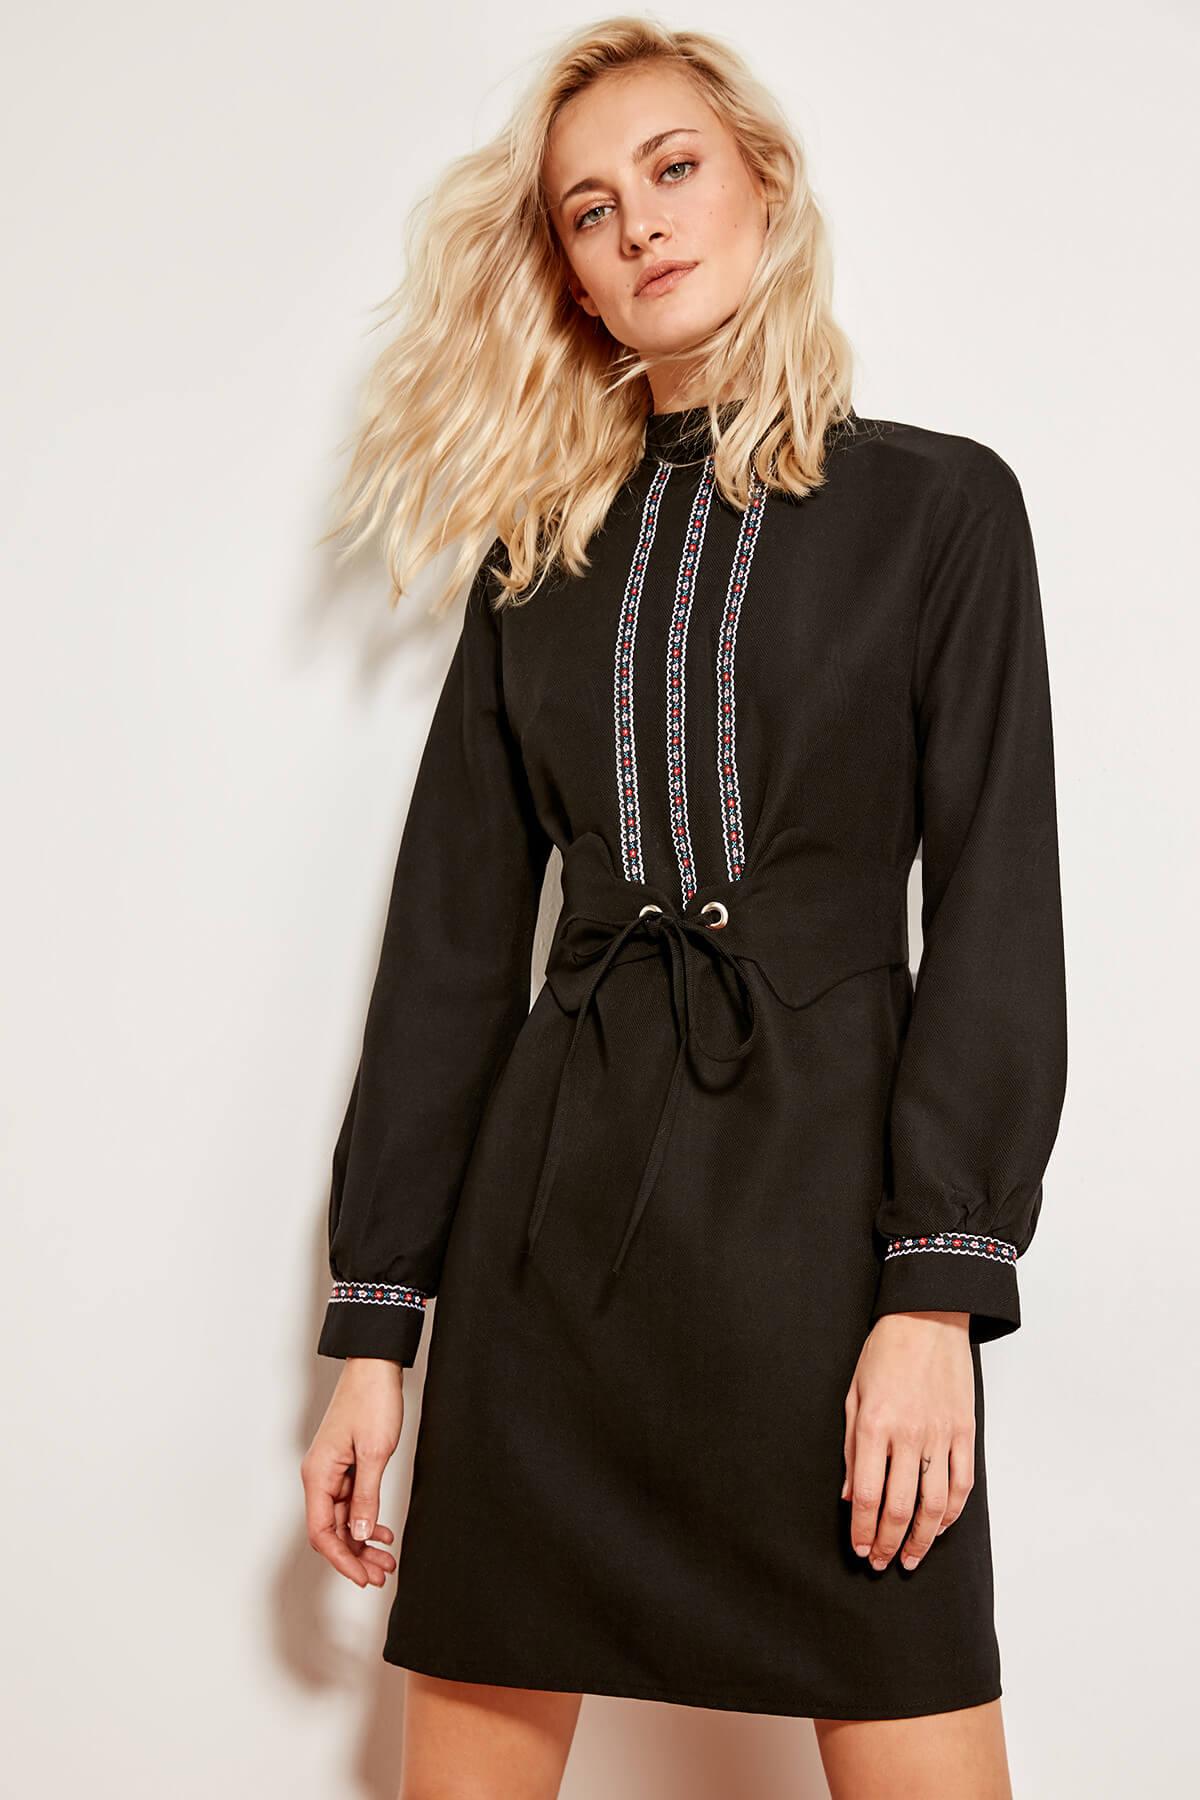 Trendyol dámske čierne šaty s opaskom